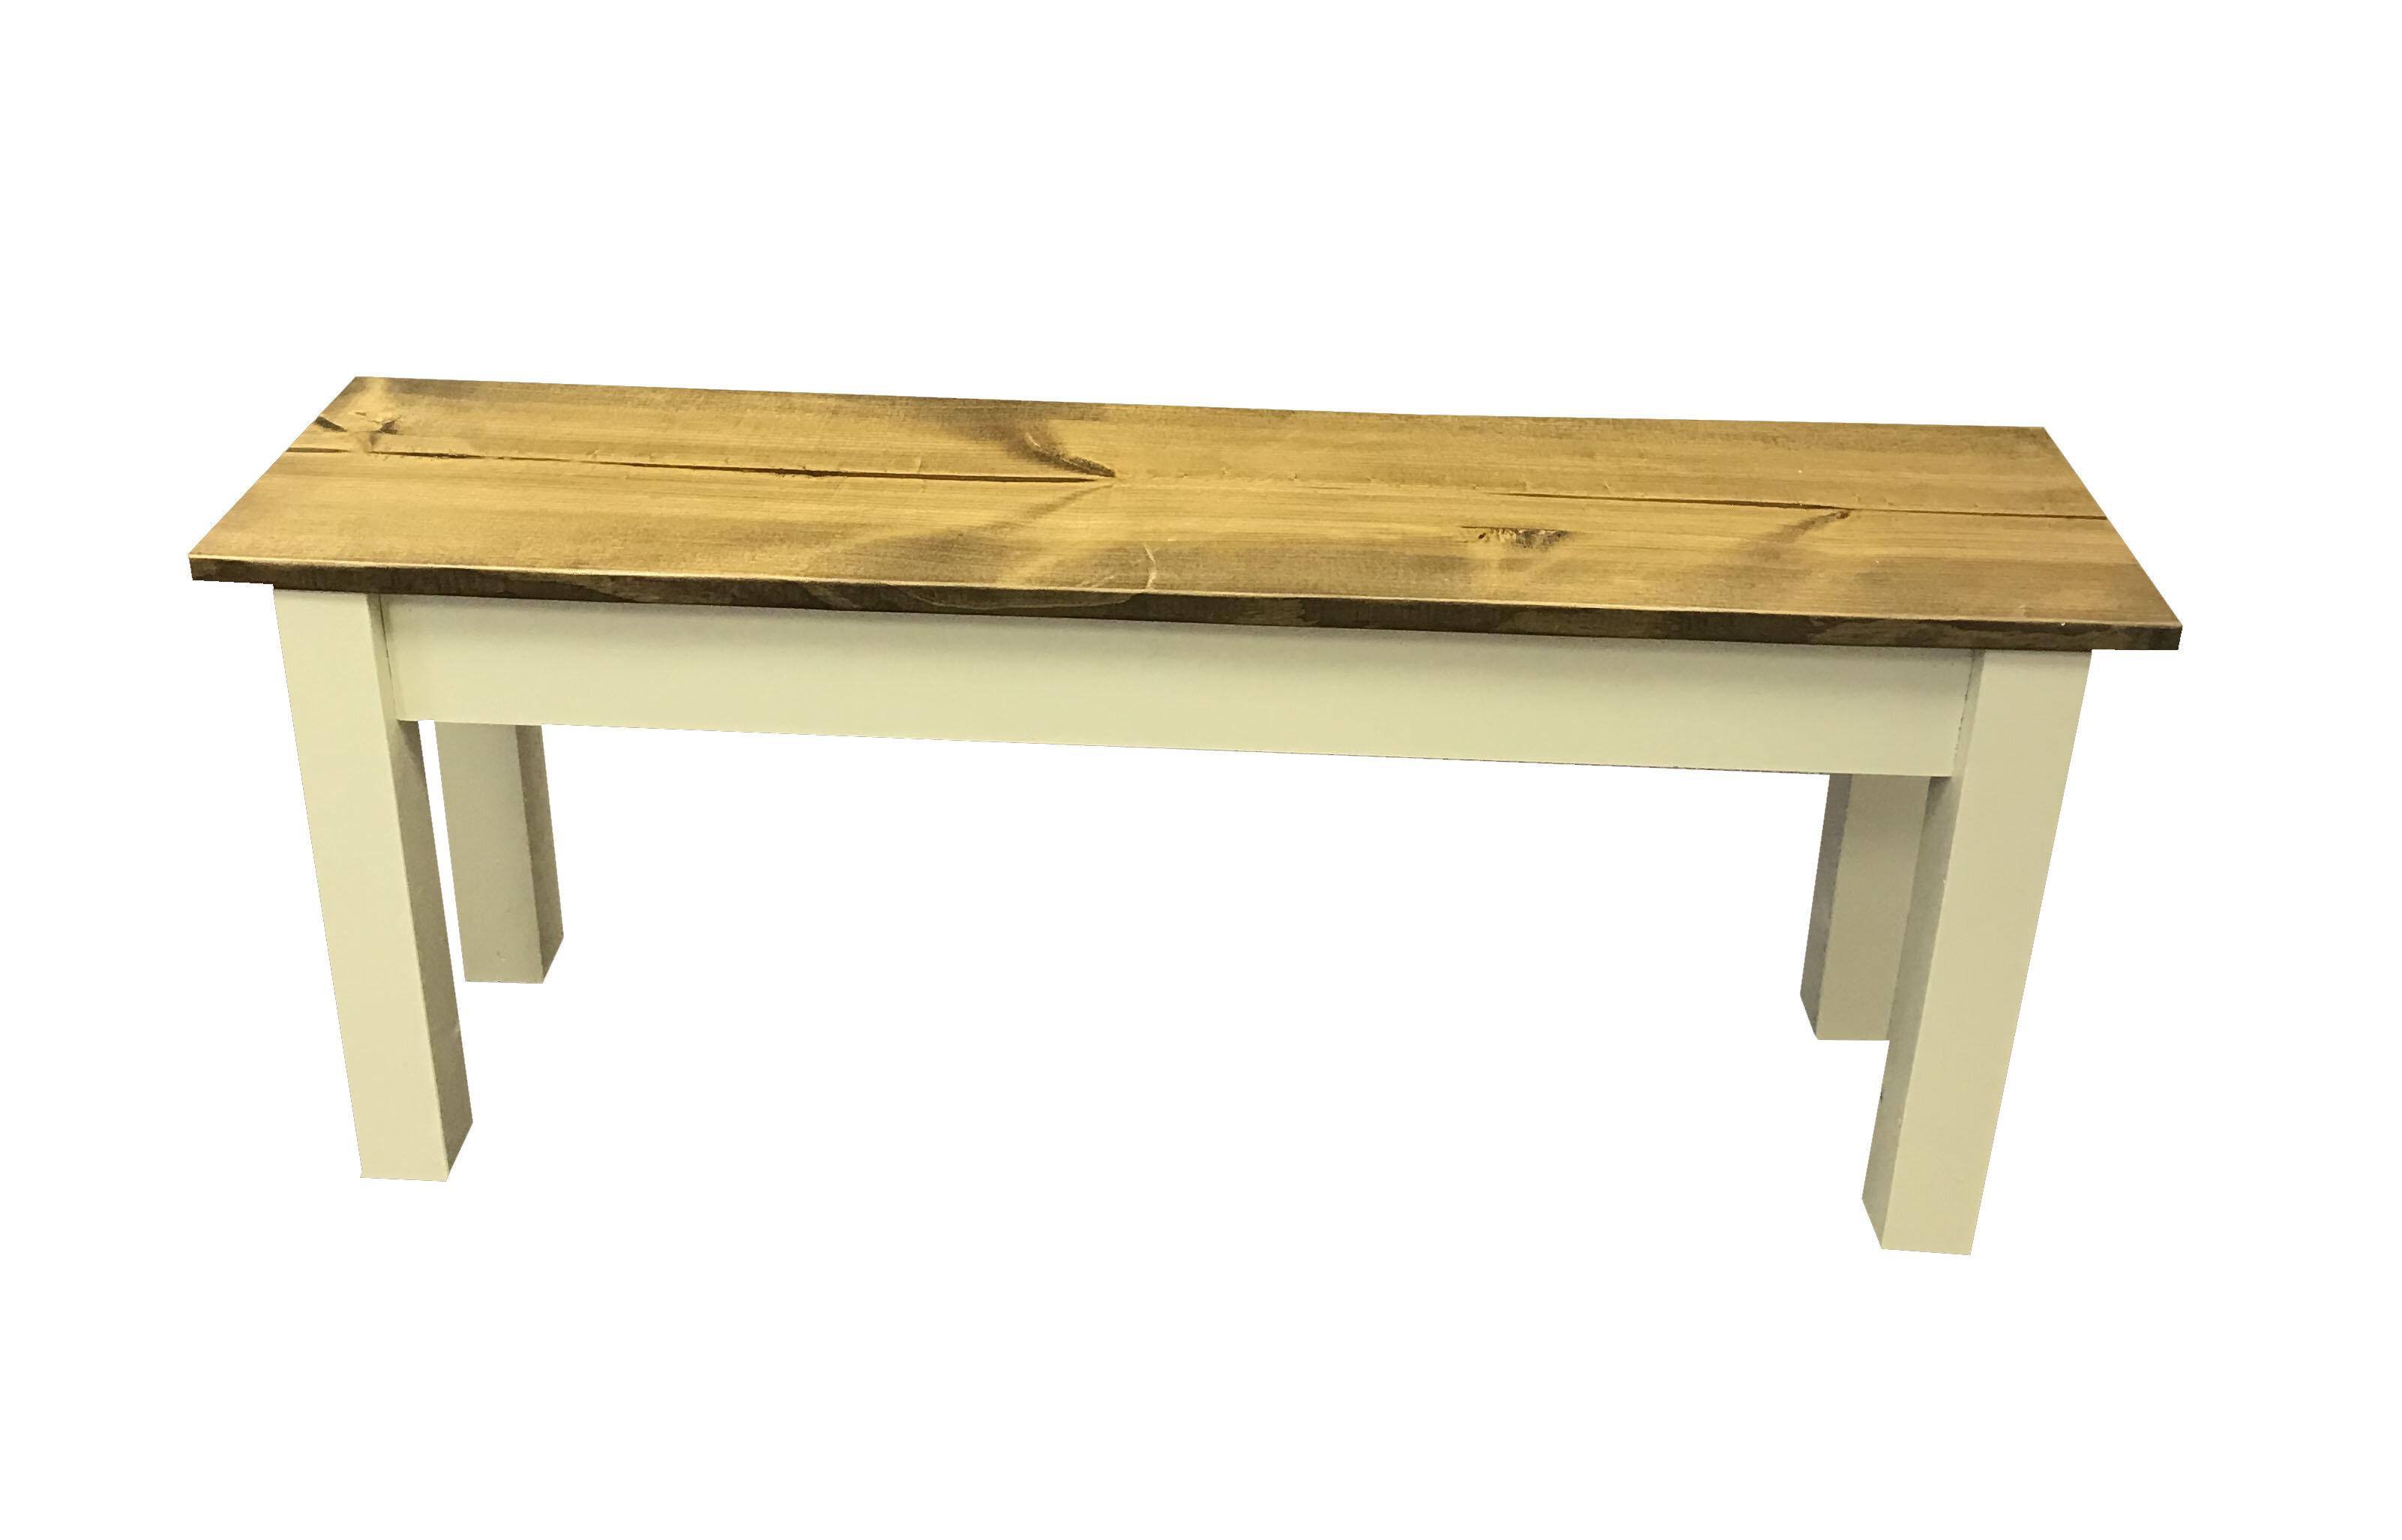 Groovy Galindo Wood Bench Ibusinesslaw Wood Chair Design Ideas Ibusinesslaworg